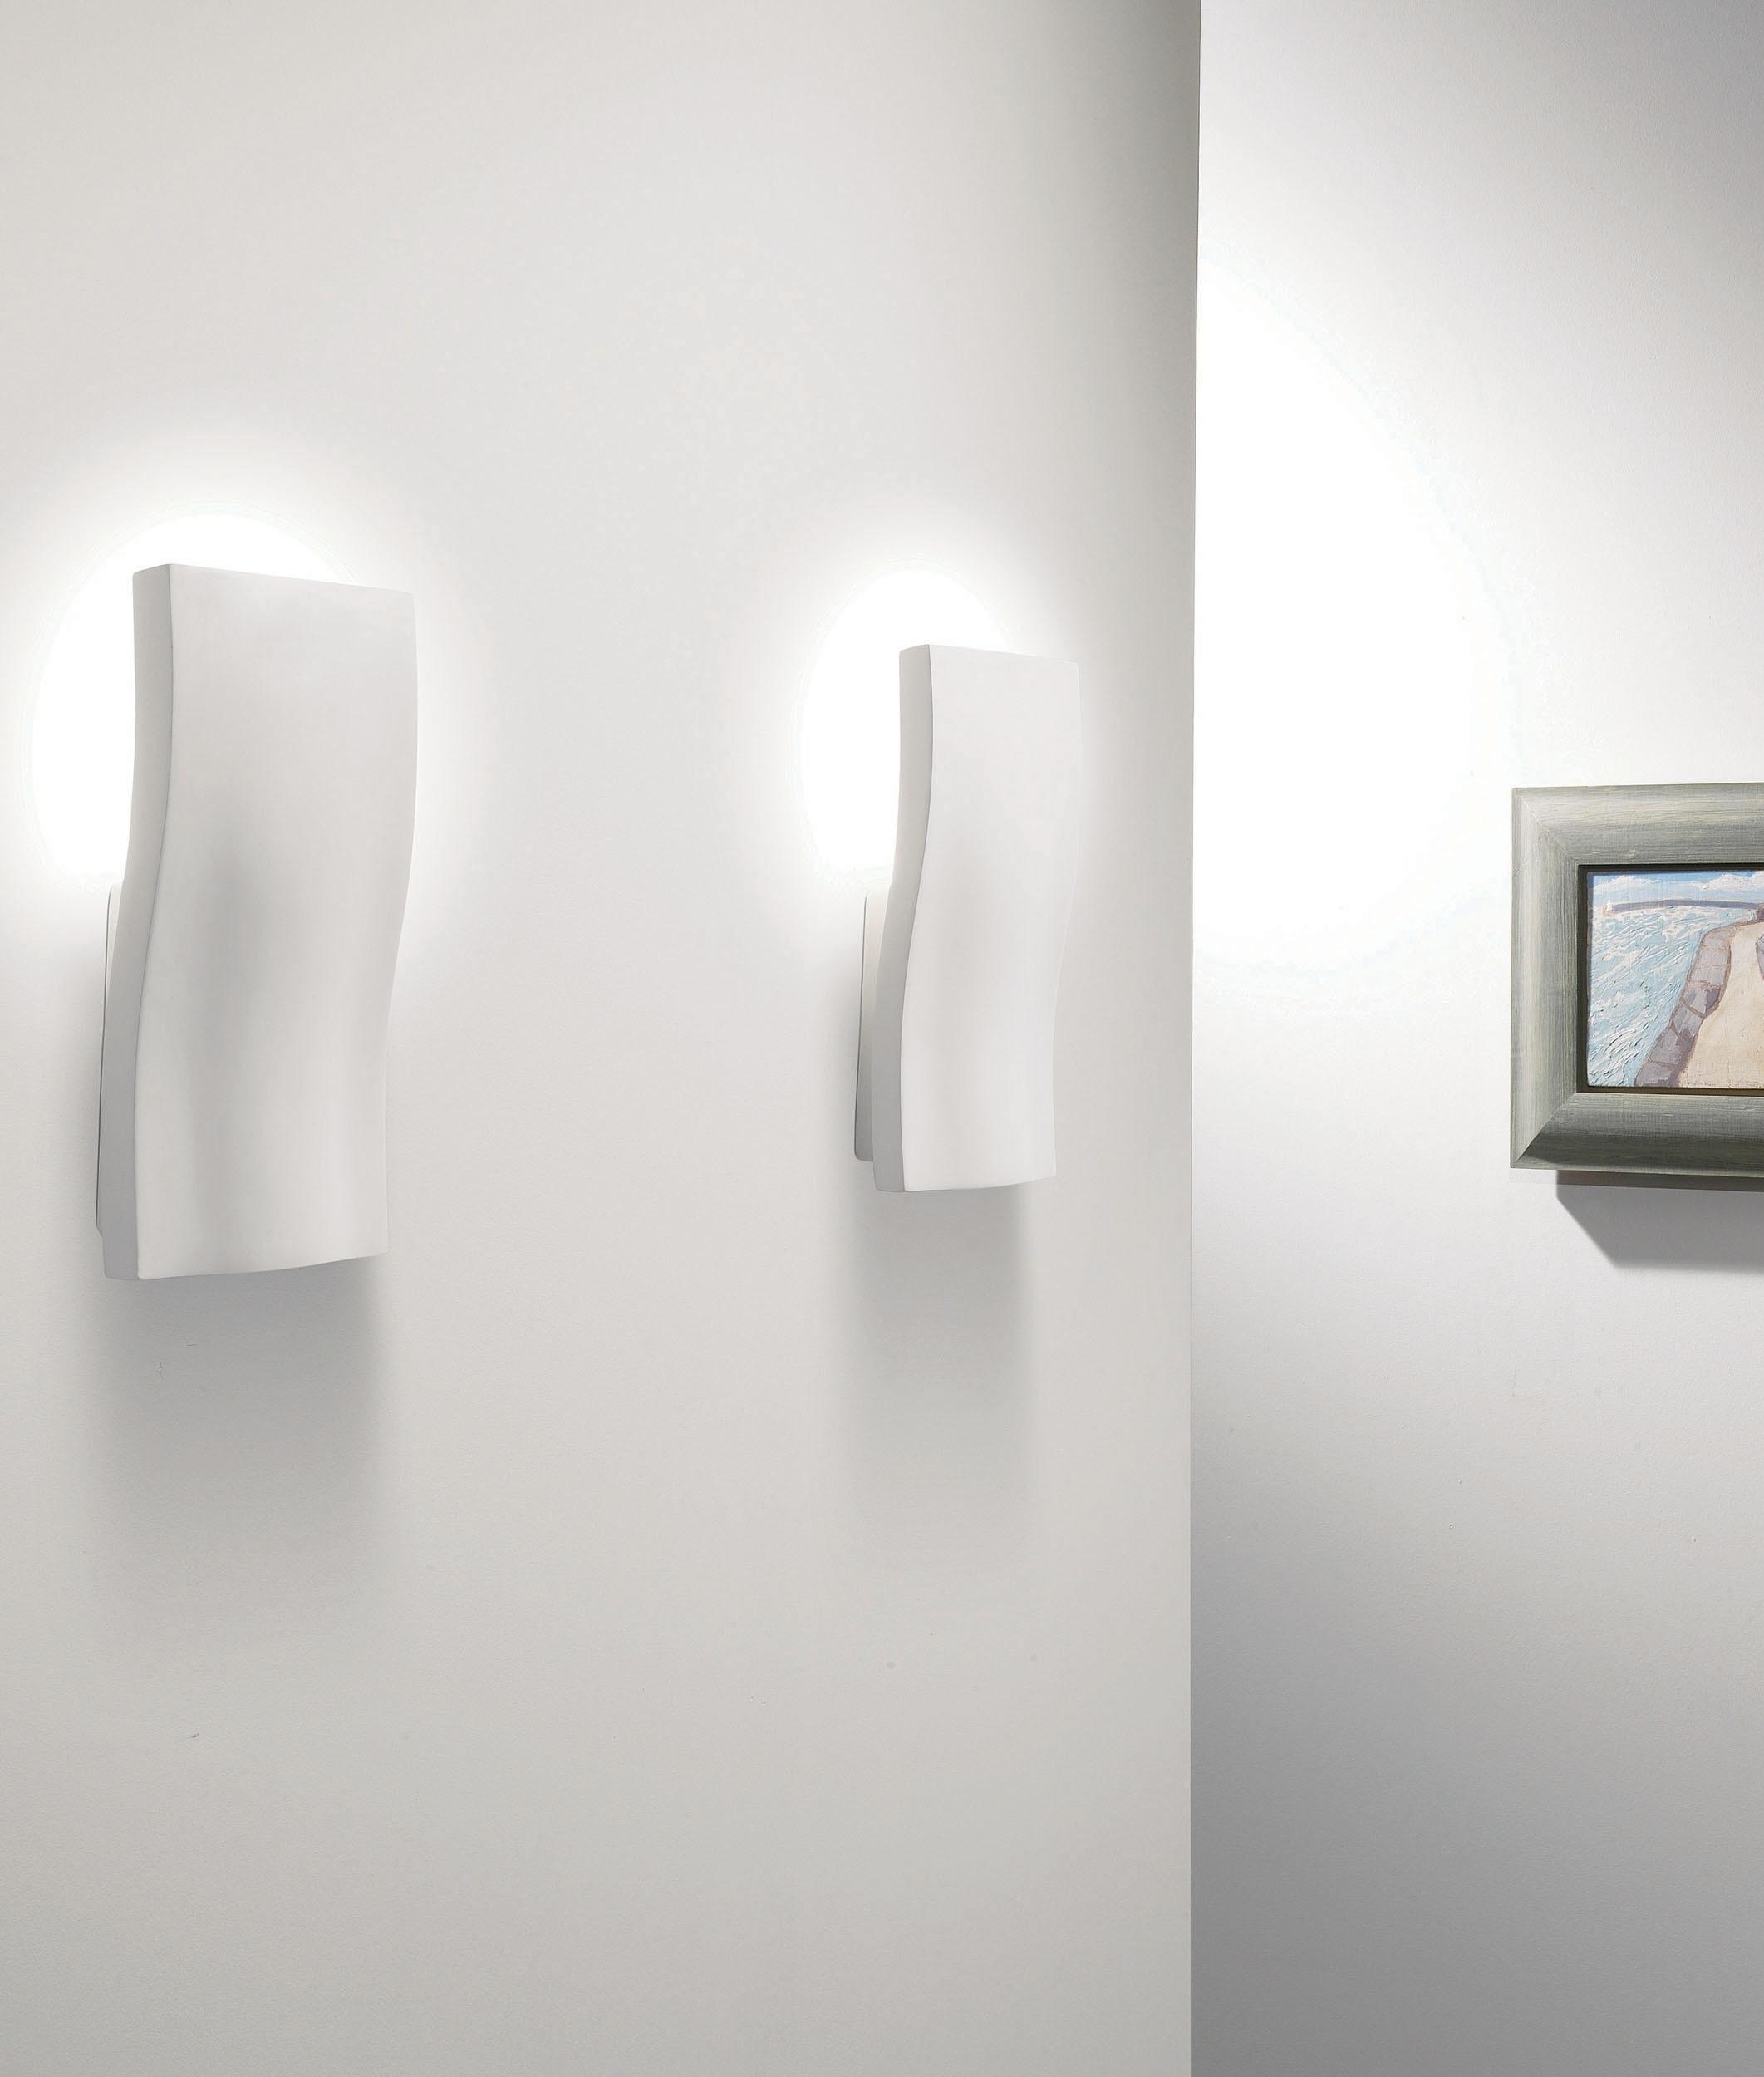 Wall Lights Plaster Finish : Plaster Wavy Wall Light Uplights the Wall in Natural Plaster Finish